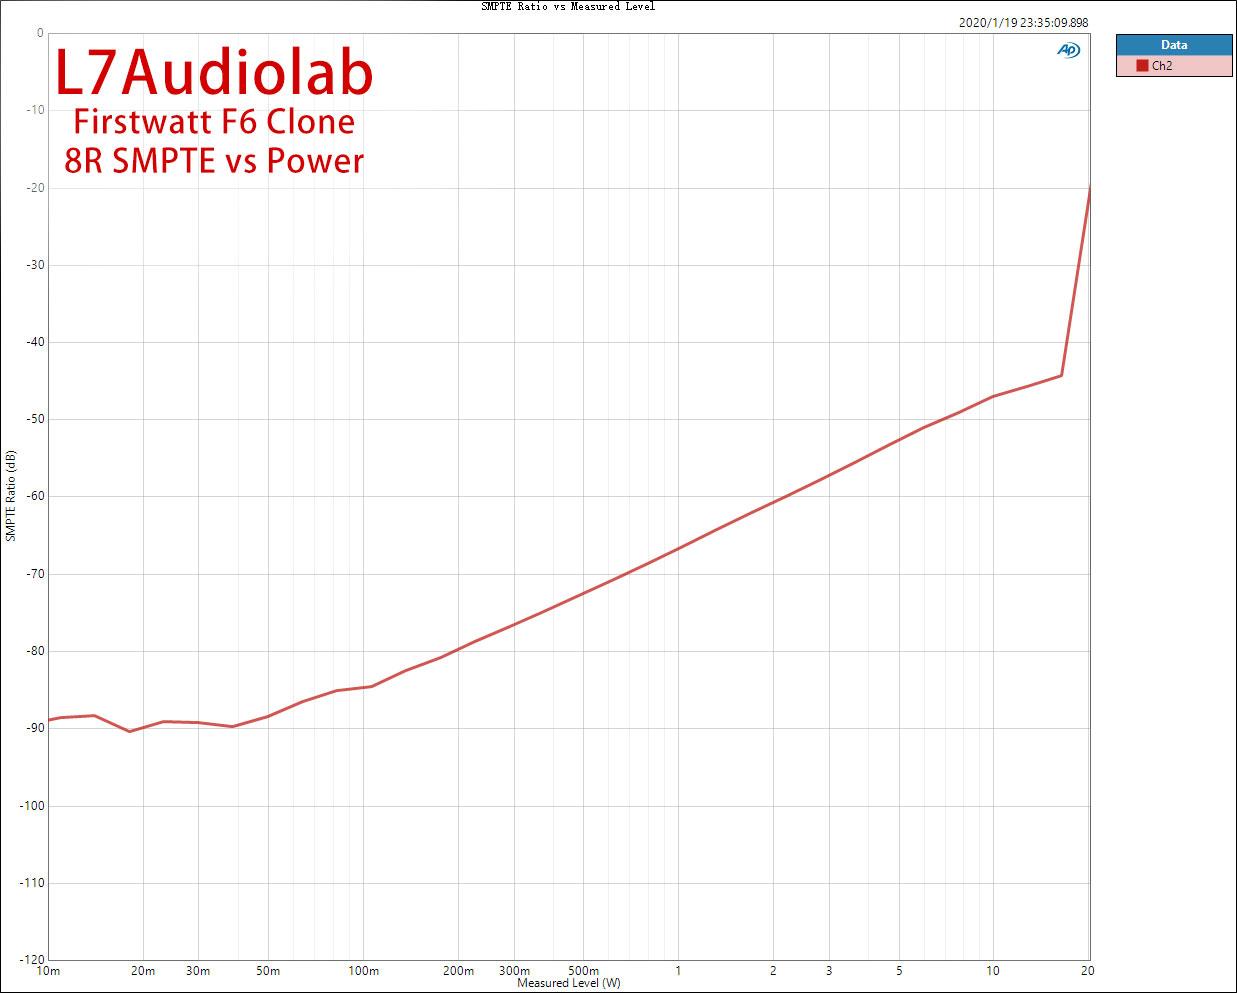 8R-SMPTE-Ratio-vs-Measured-Level.jpg